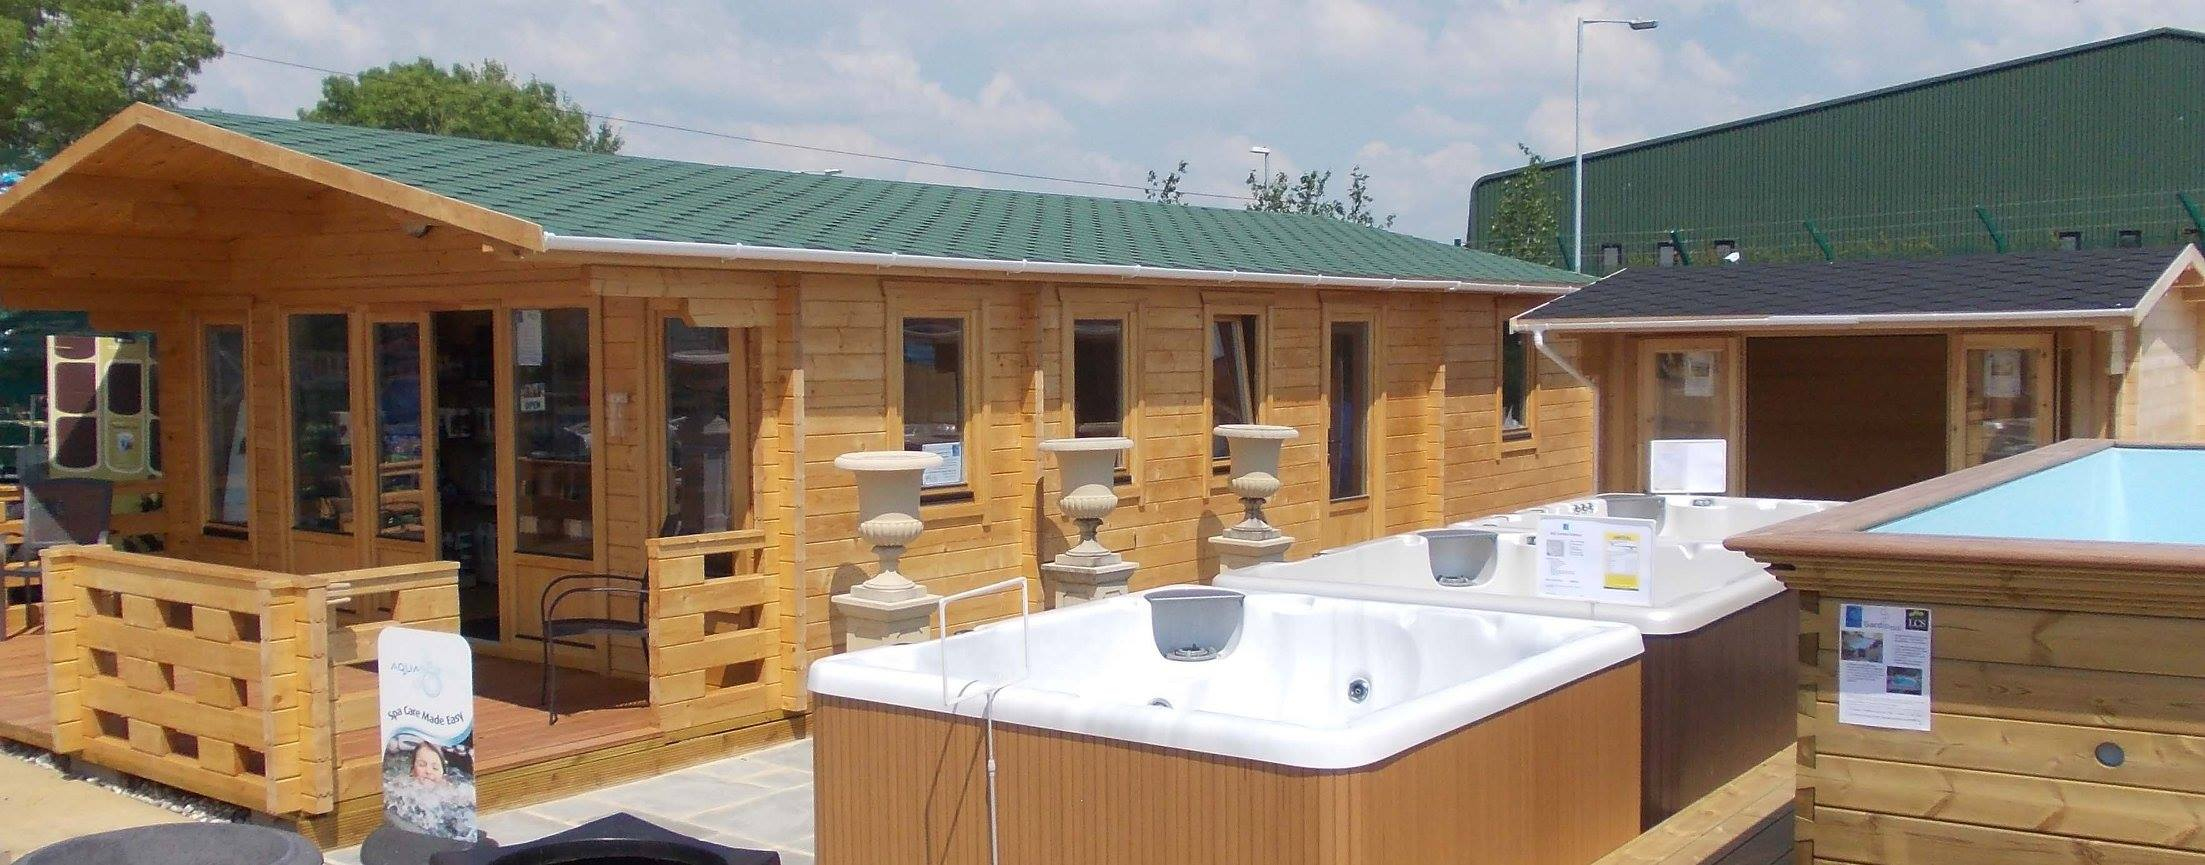 Inspired Cabins Log Cabin Showroom